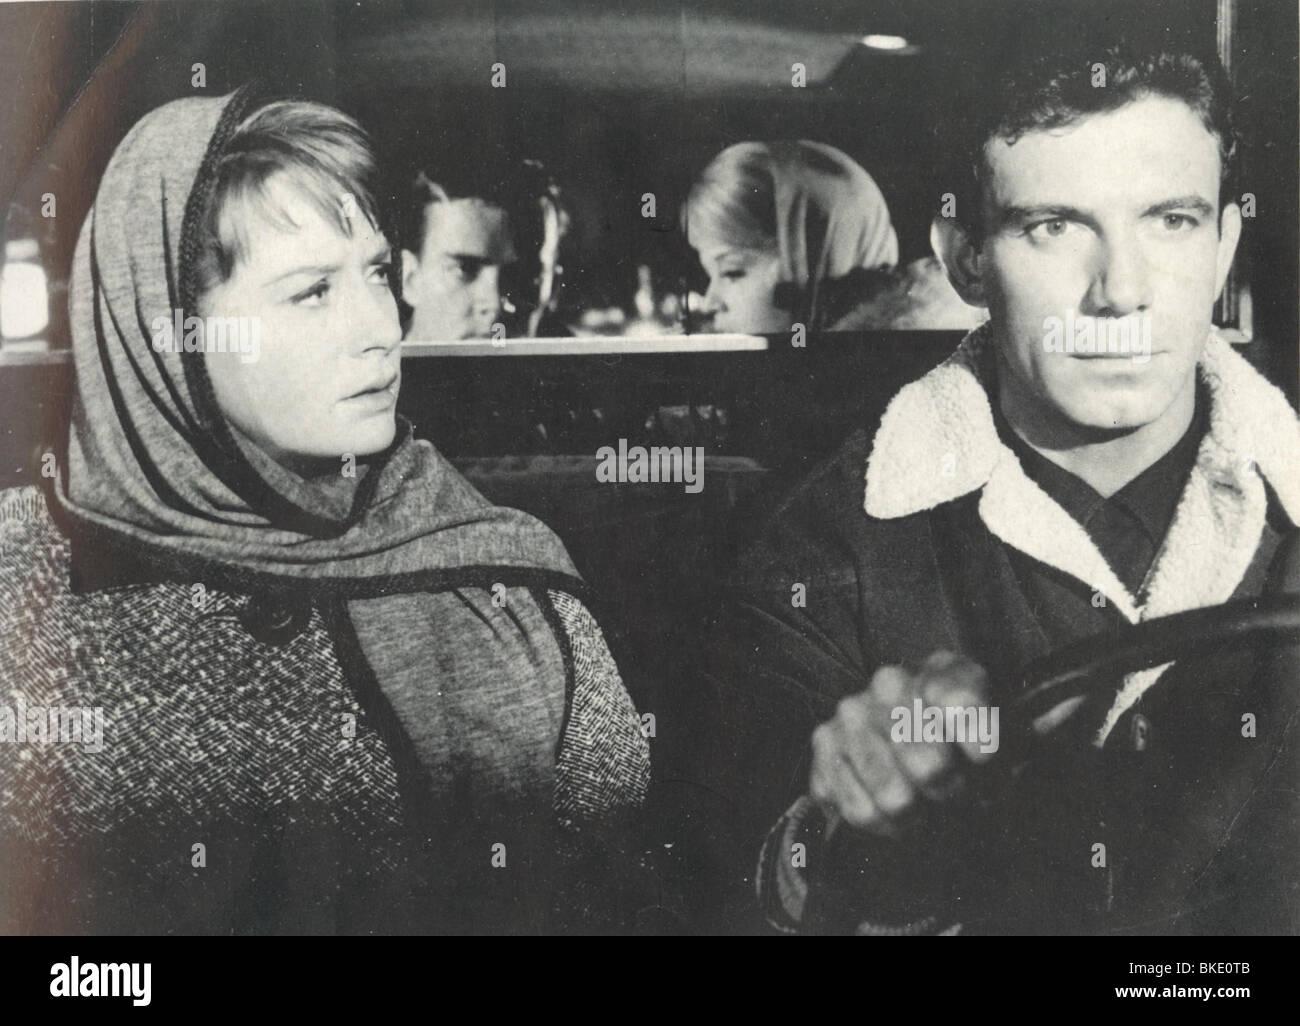 PERIOD OF ADJUSTMENT (1962) LOIS NETTLETON, TONY FRANCIOSA POFA 003FOH - Stock Image